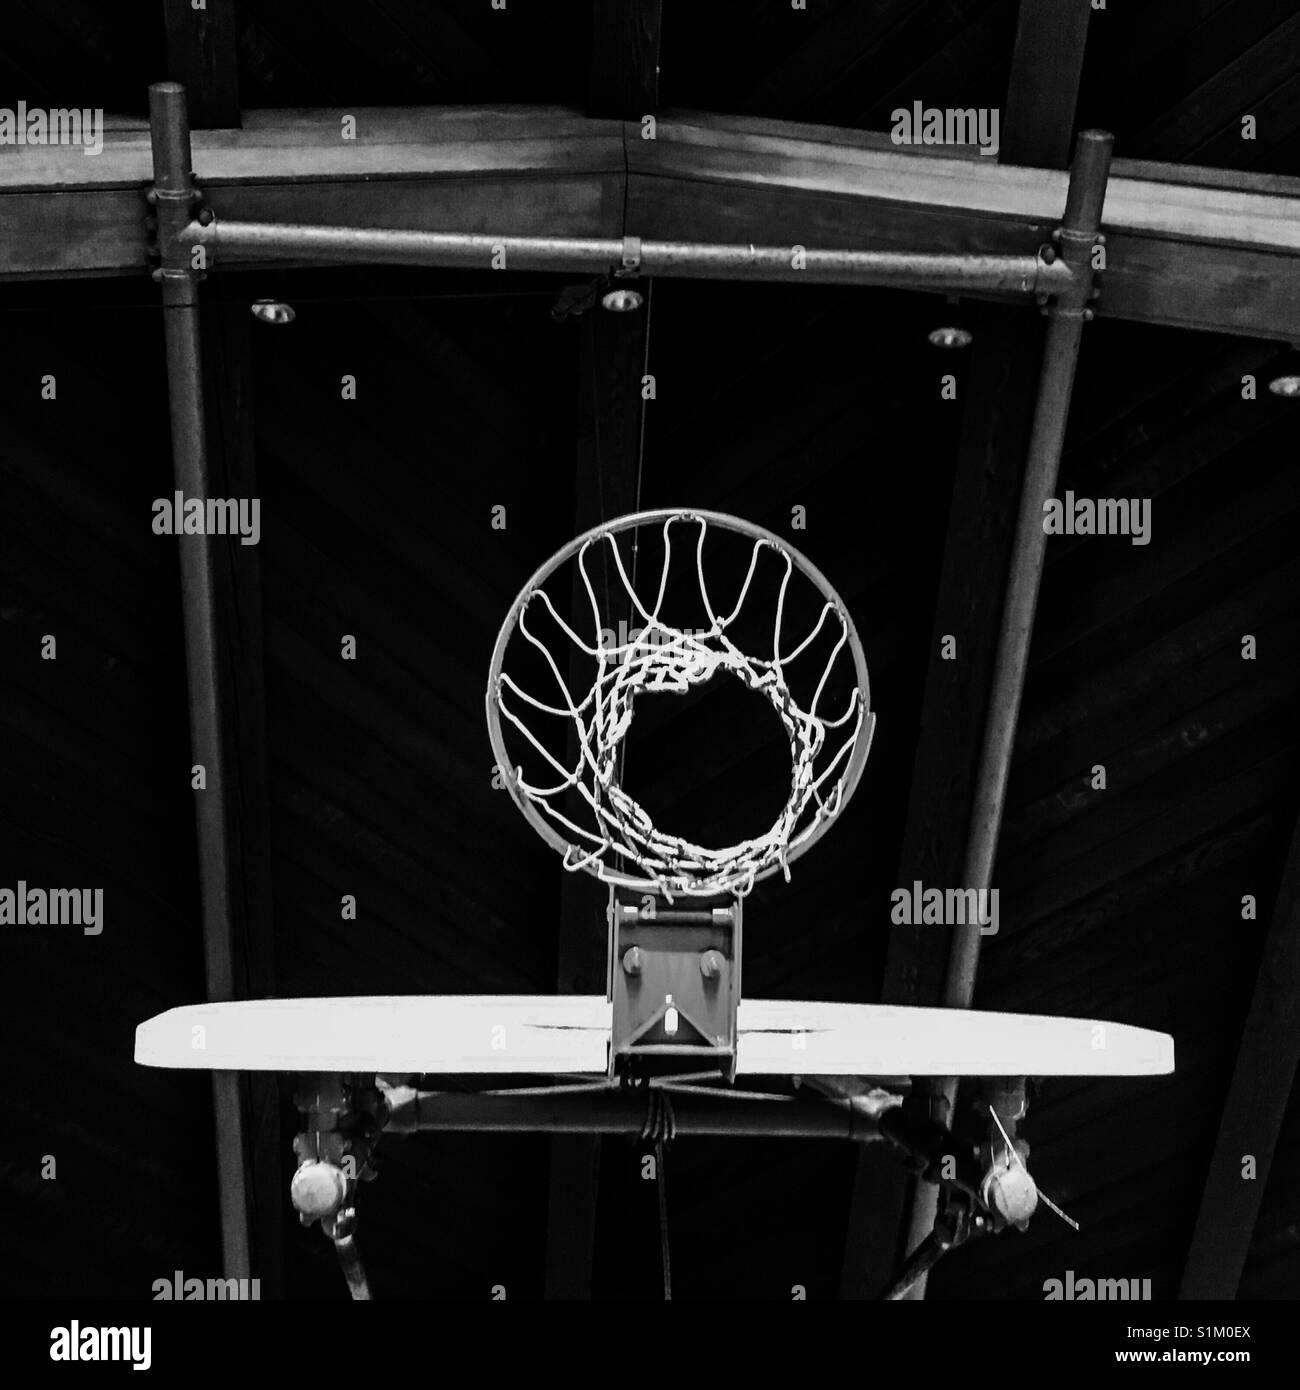 Basketball hoop from below - Stock Image